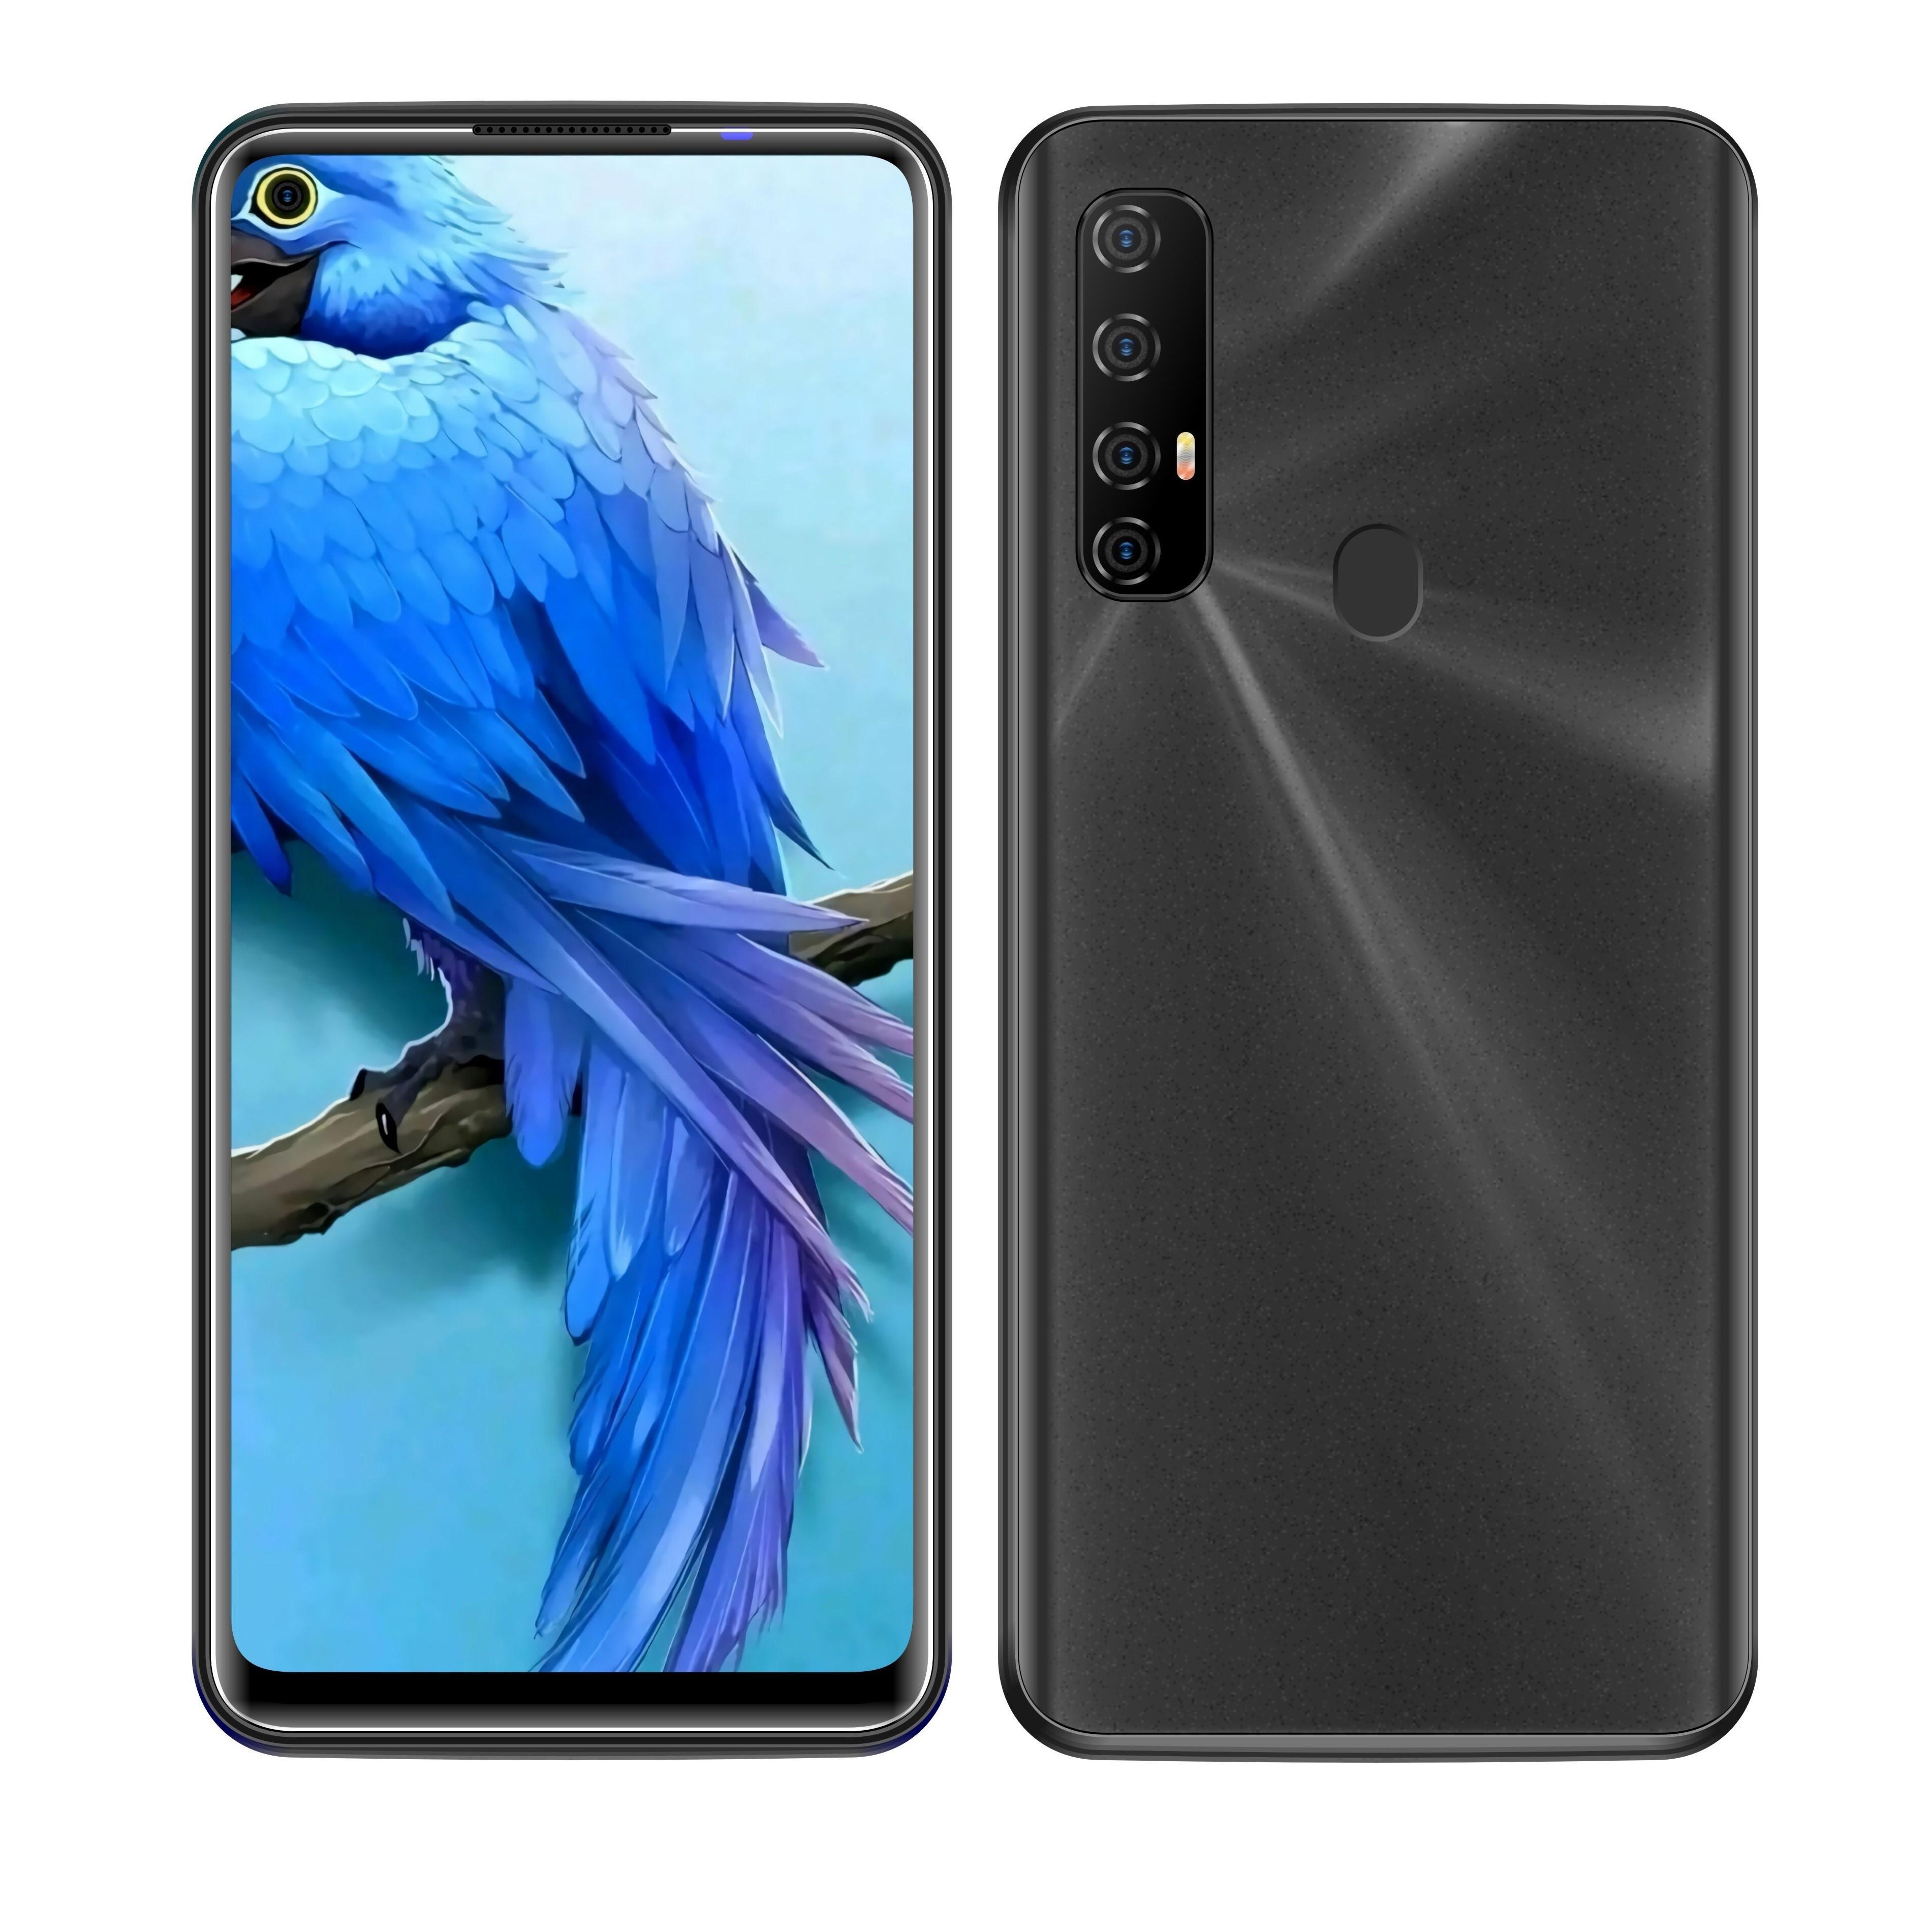 phone 6.7 inch All Screen A30S 3G 4G Mobile Phone 1GB RAM 8GB ROM Face Finger Print Dual SIM Card Smart Phone